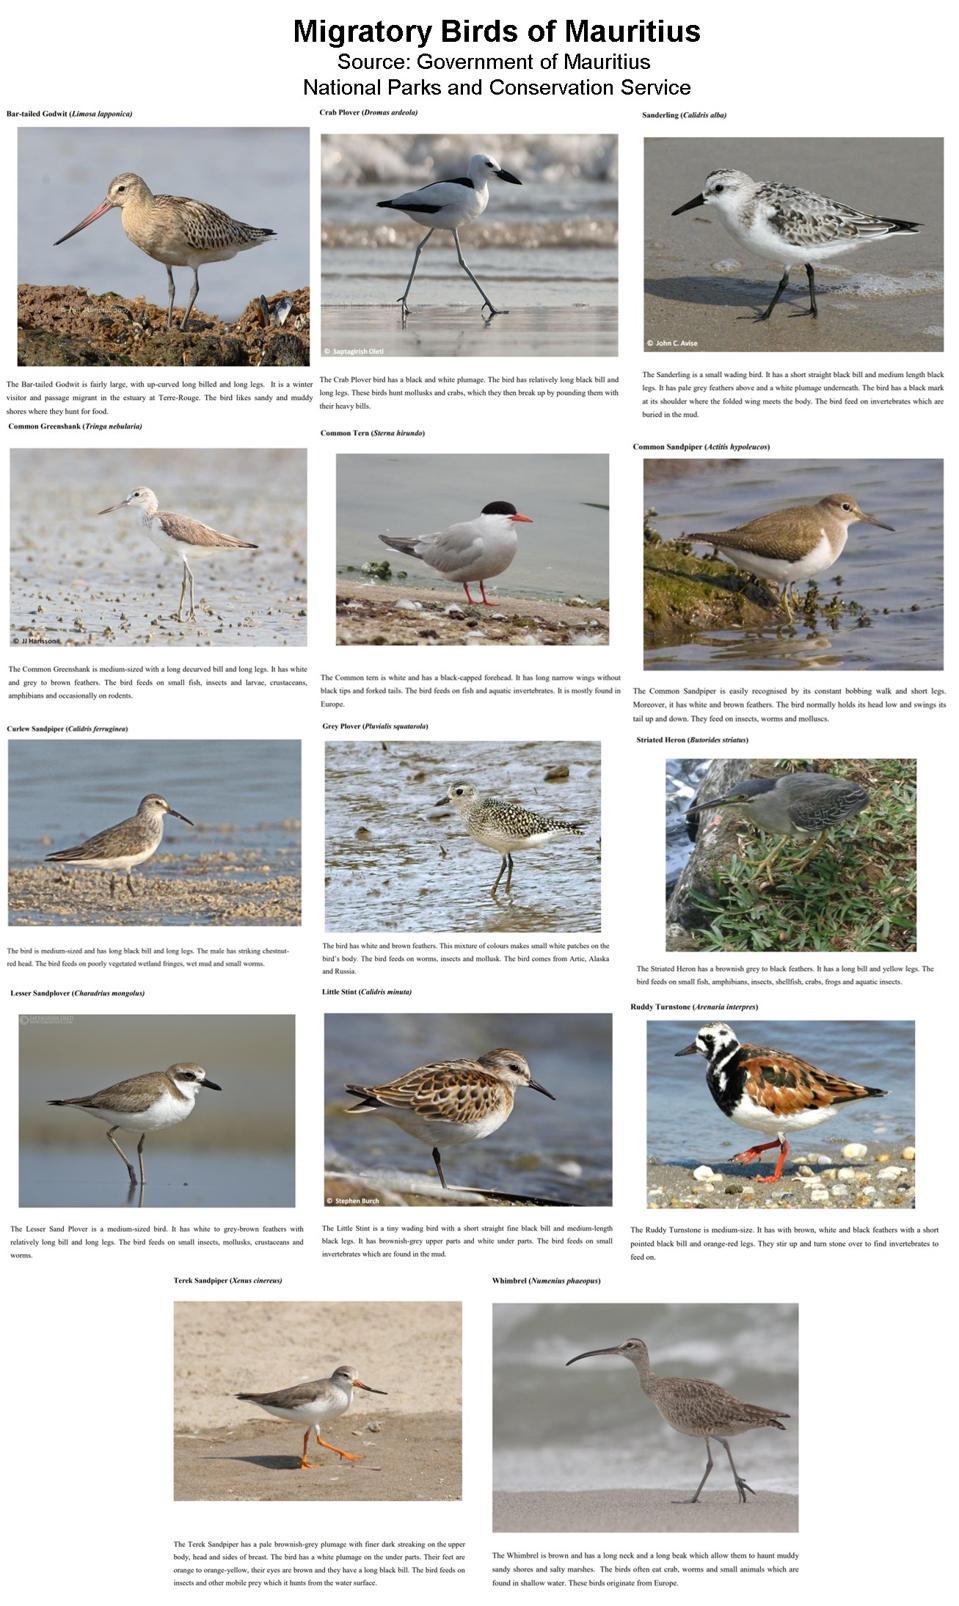 14 of the main migratory birds through Mauritius